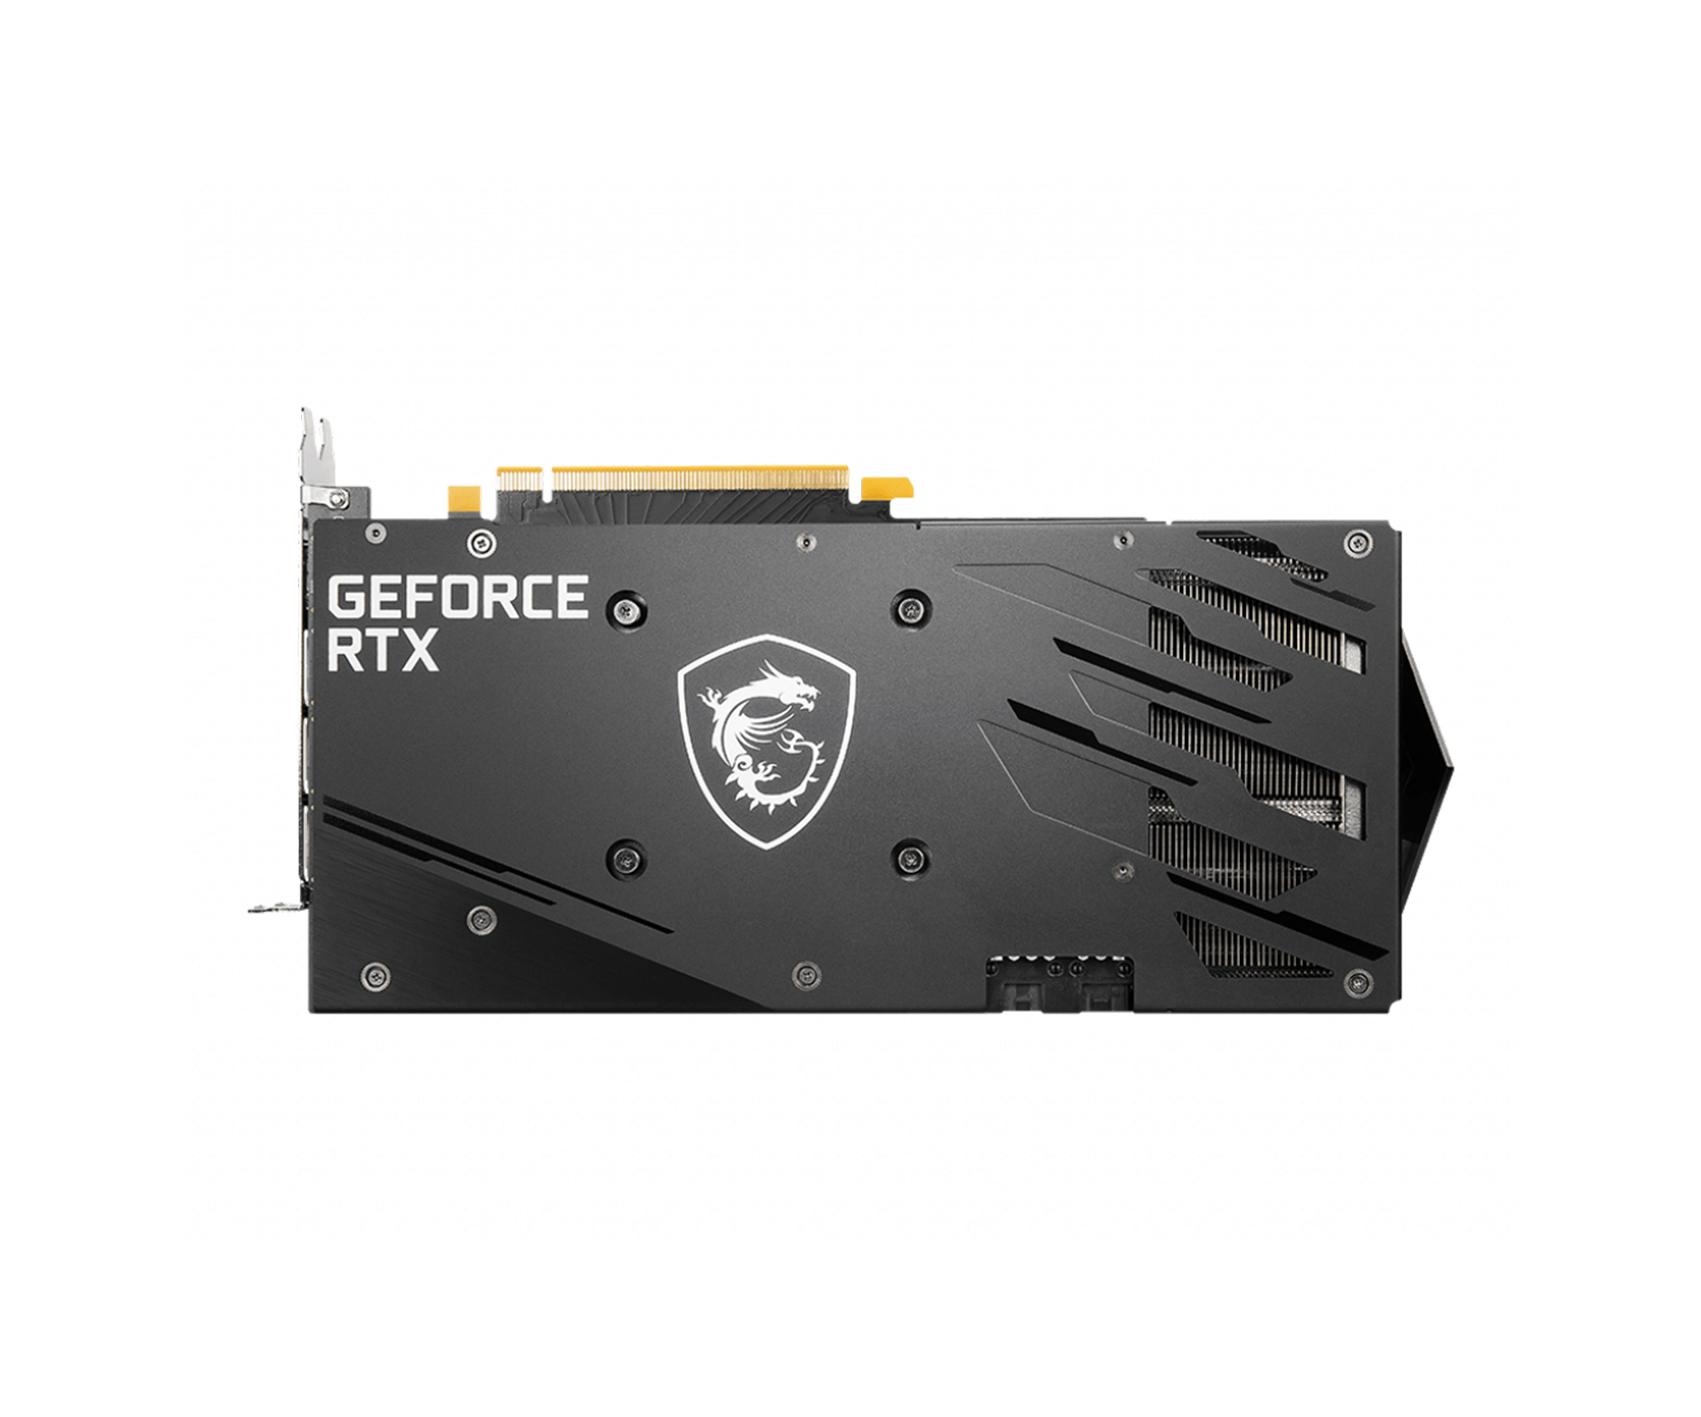 MSI RTX 3060 GAMING X 12GB GDDR6 Graphic Card